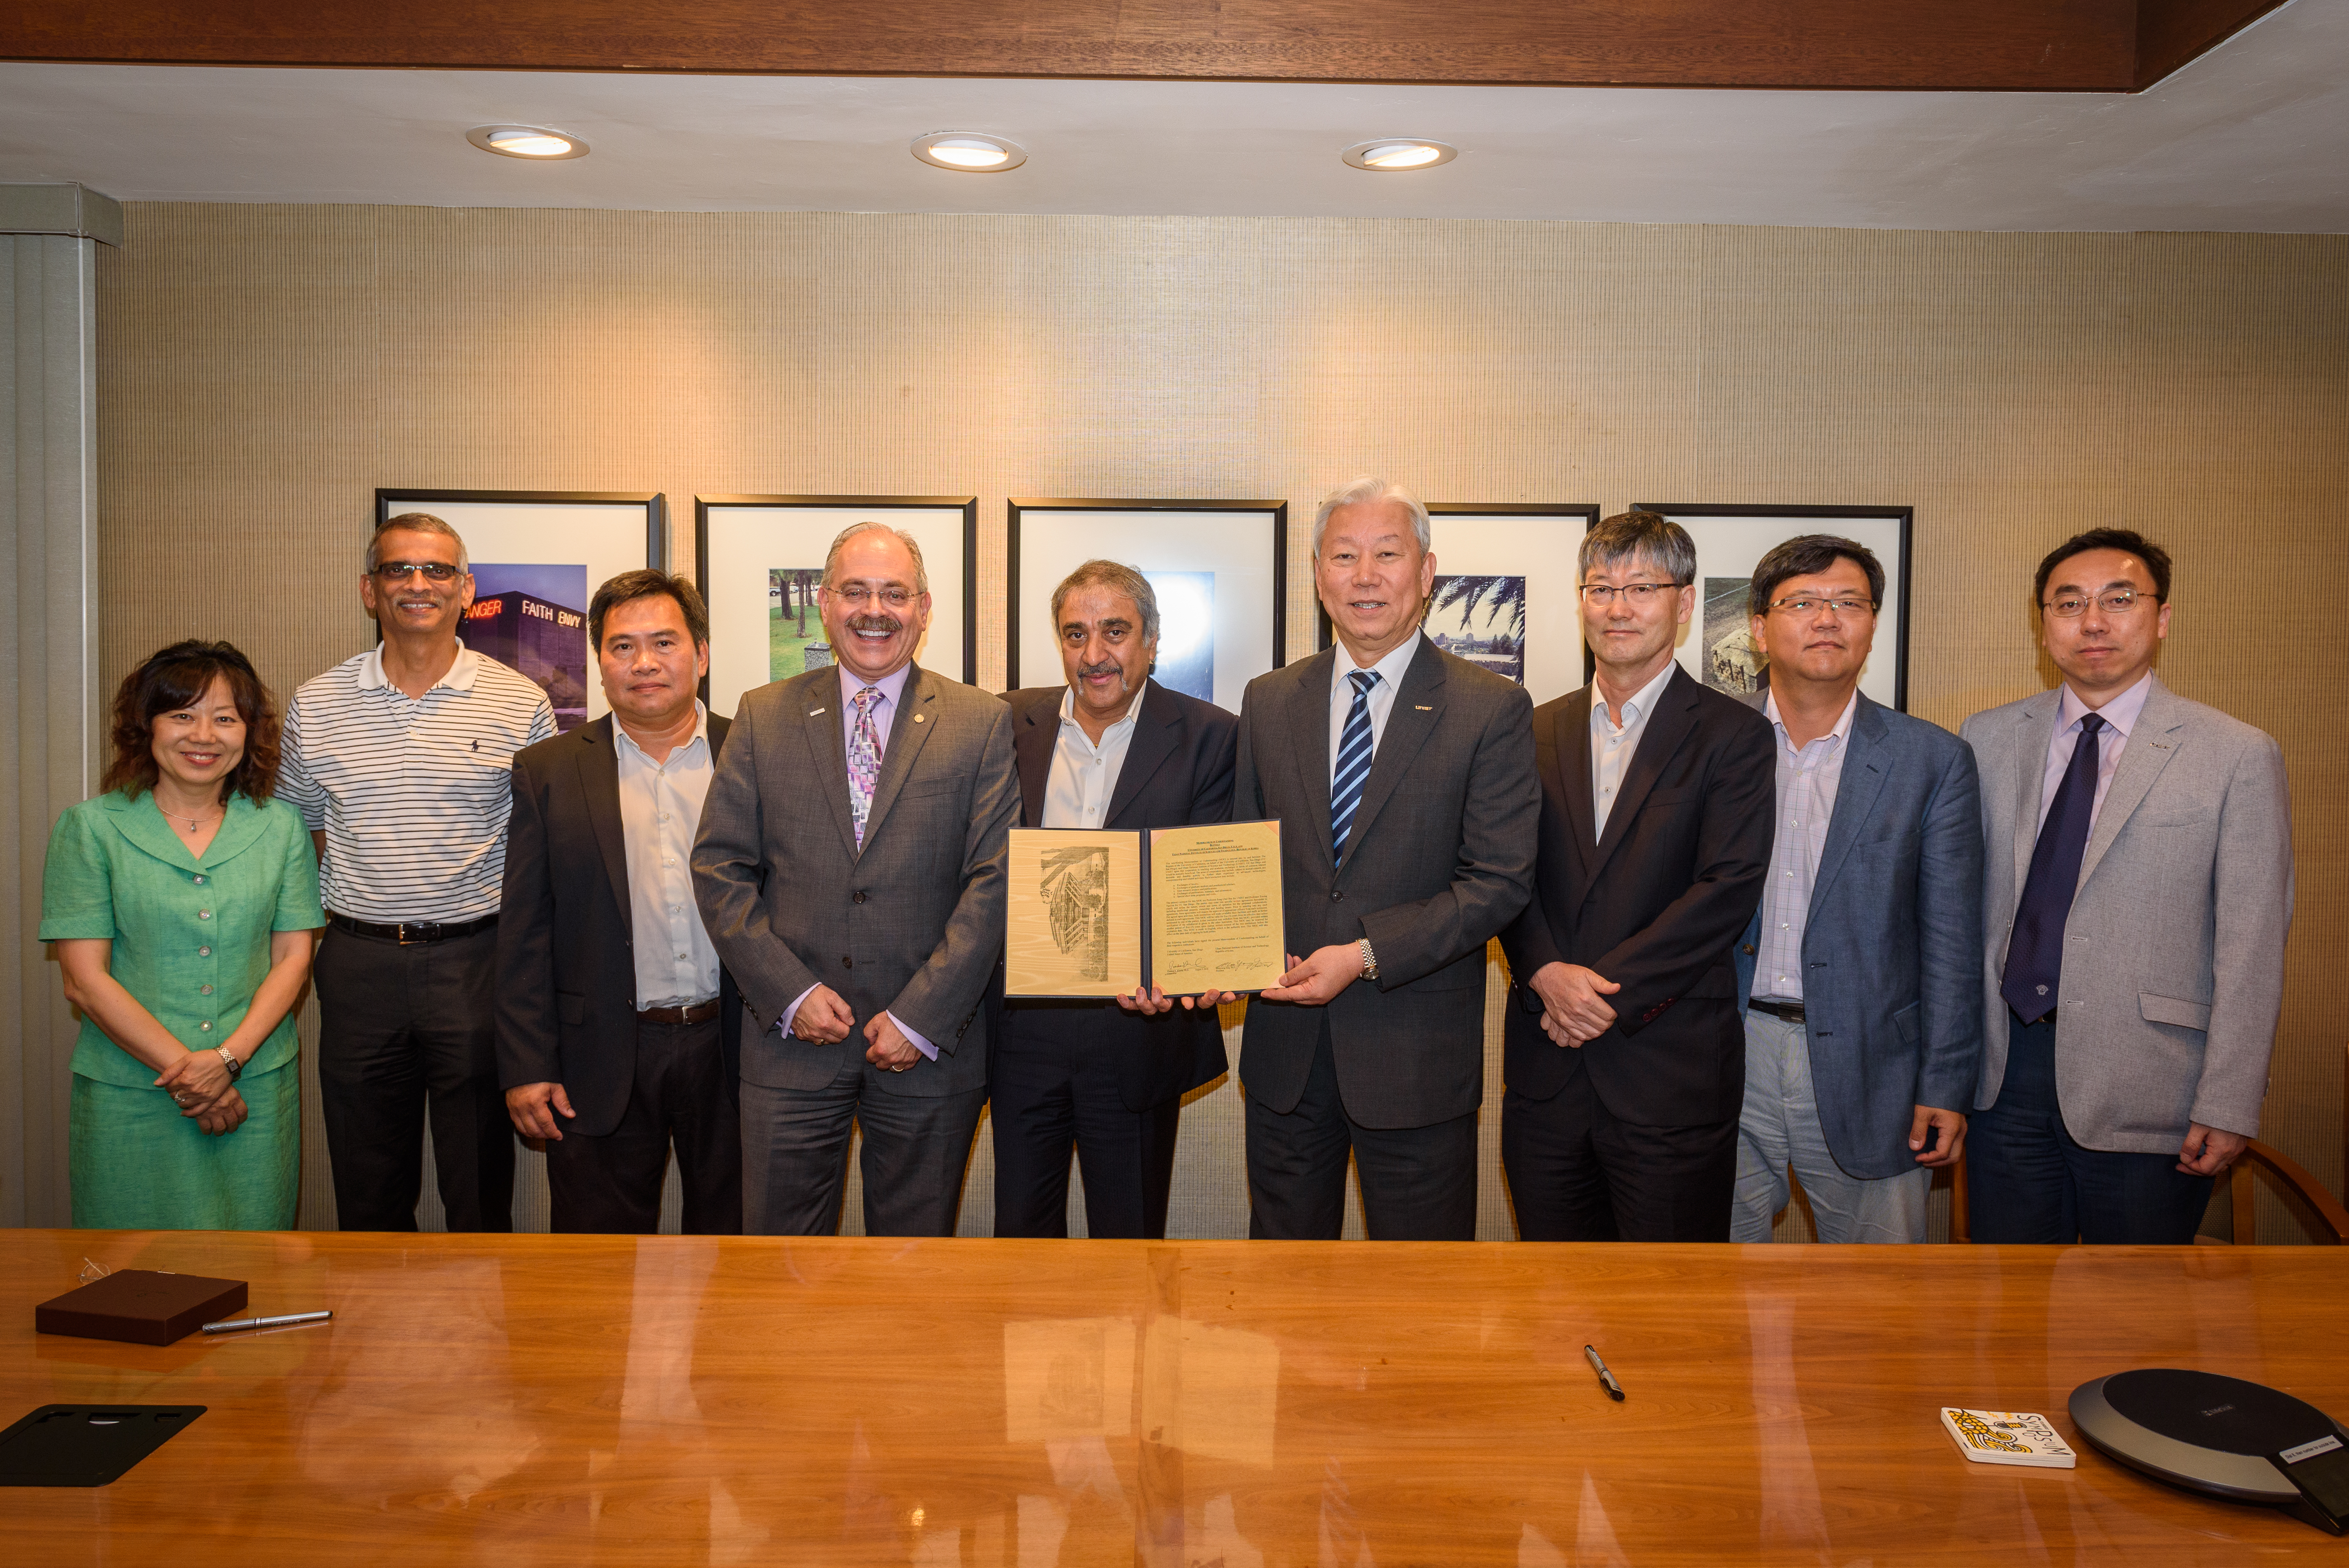 UNIST와 UCSD가 공동연구는 물론 창업 및 기술사업화 협력을 약속하는 MOU를 체결했다